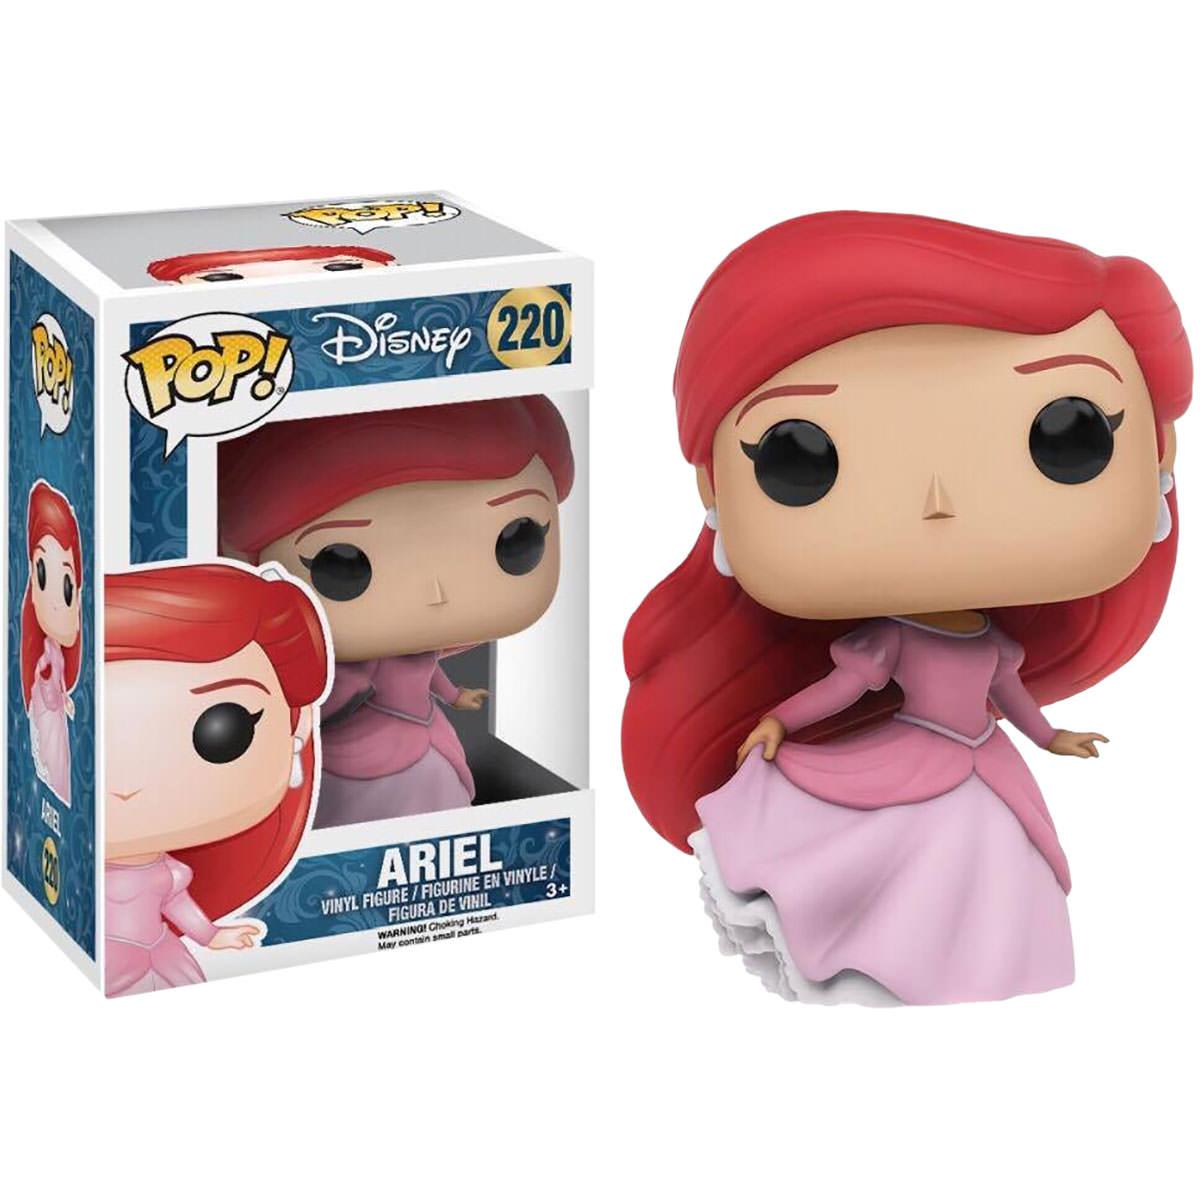 Funko Disney Princess - Ariel Pop! Vinyl Figure at Hobby ...